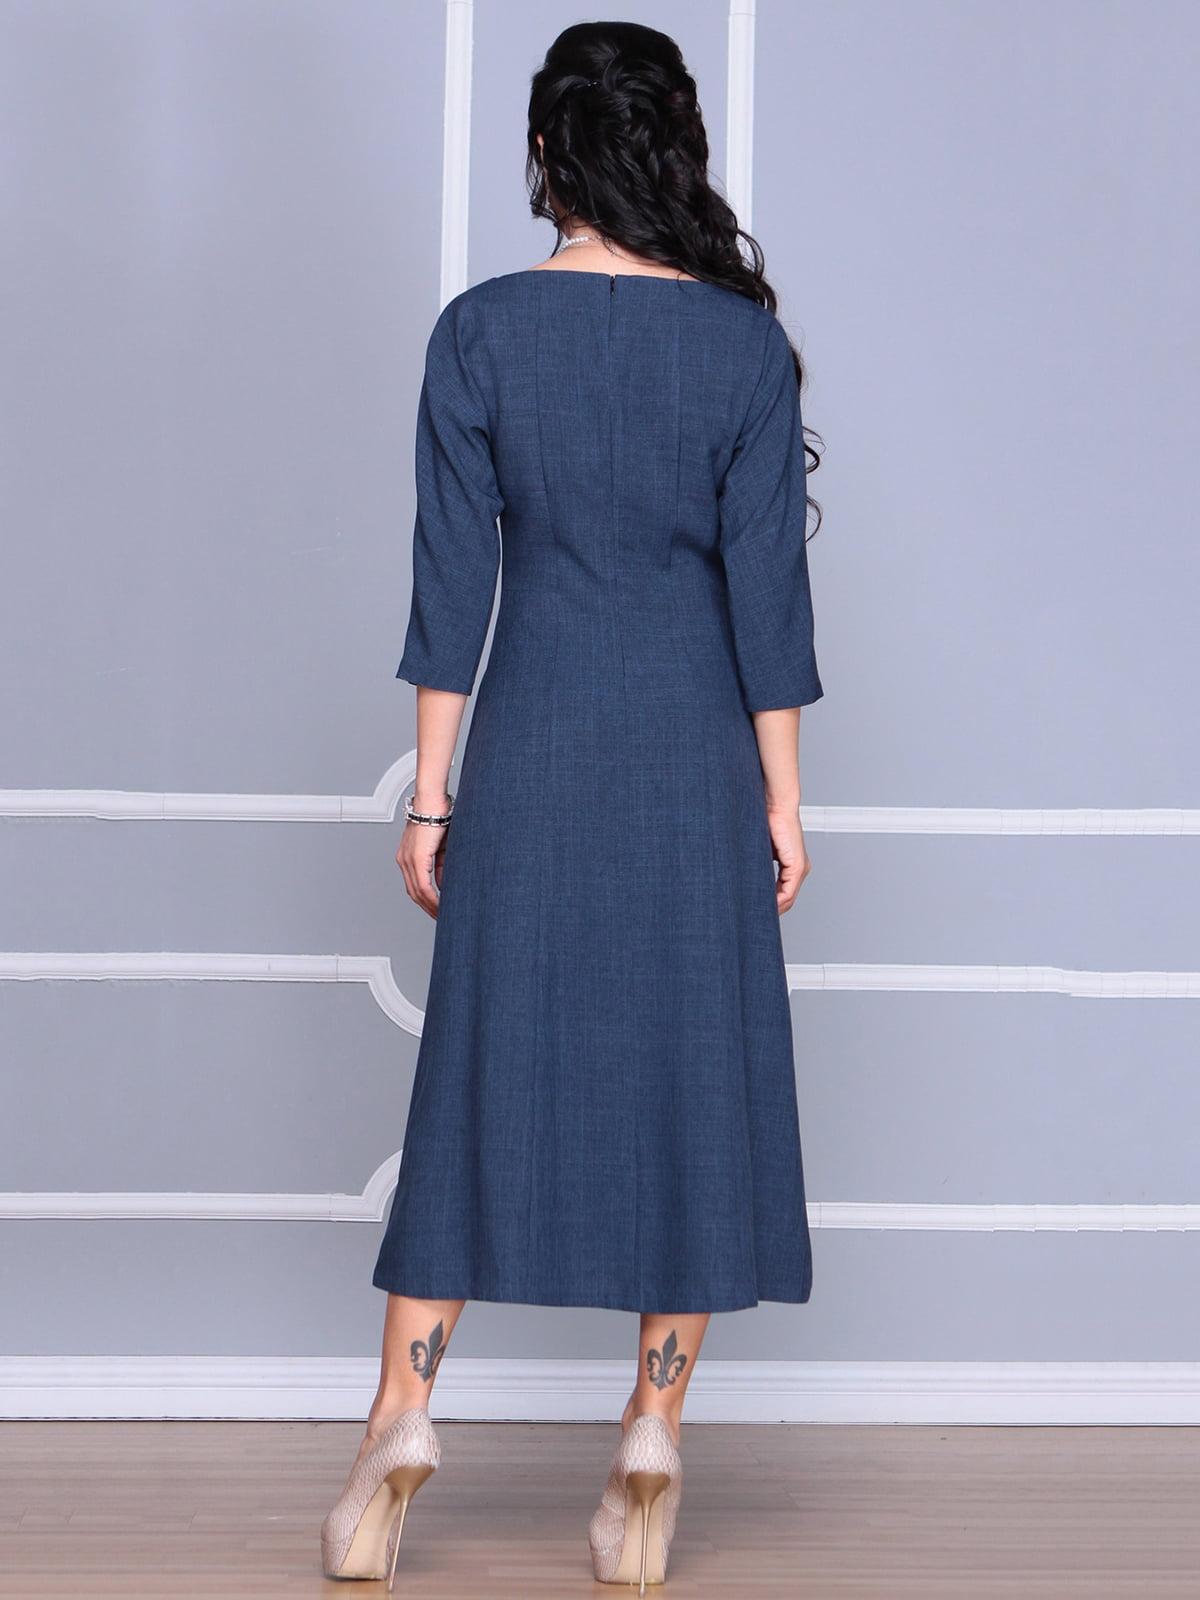 Платье темно-синее   4186806   фото 2